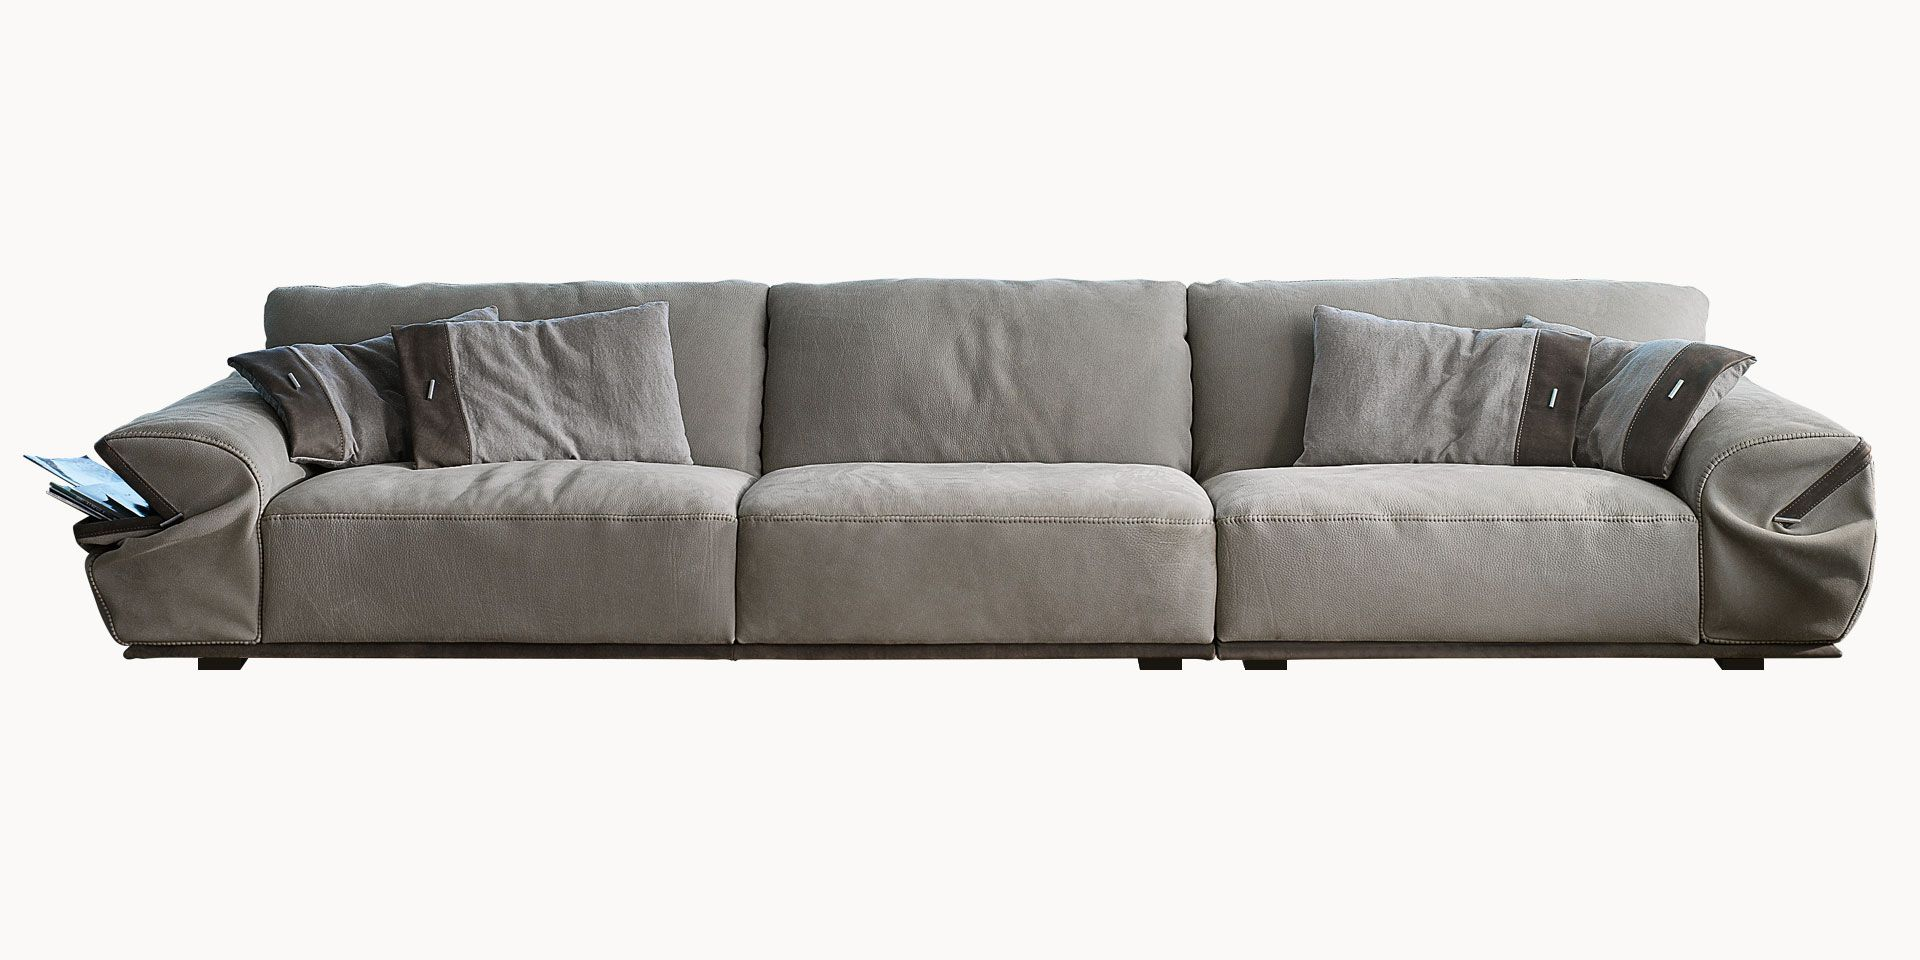 Sofa Limousine 이미지 포함 쇼파